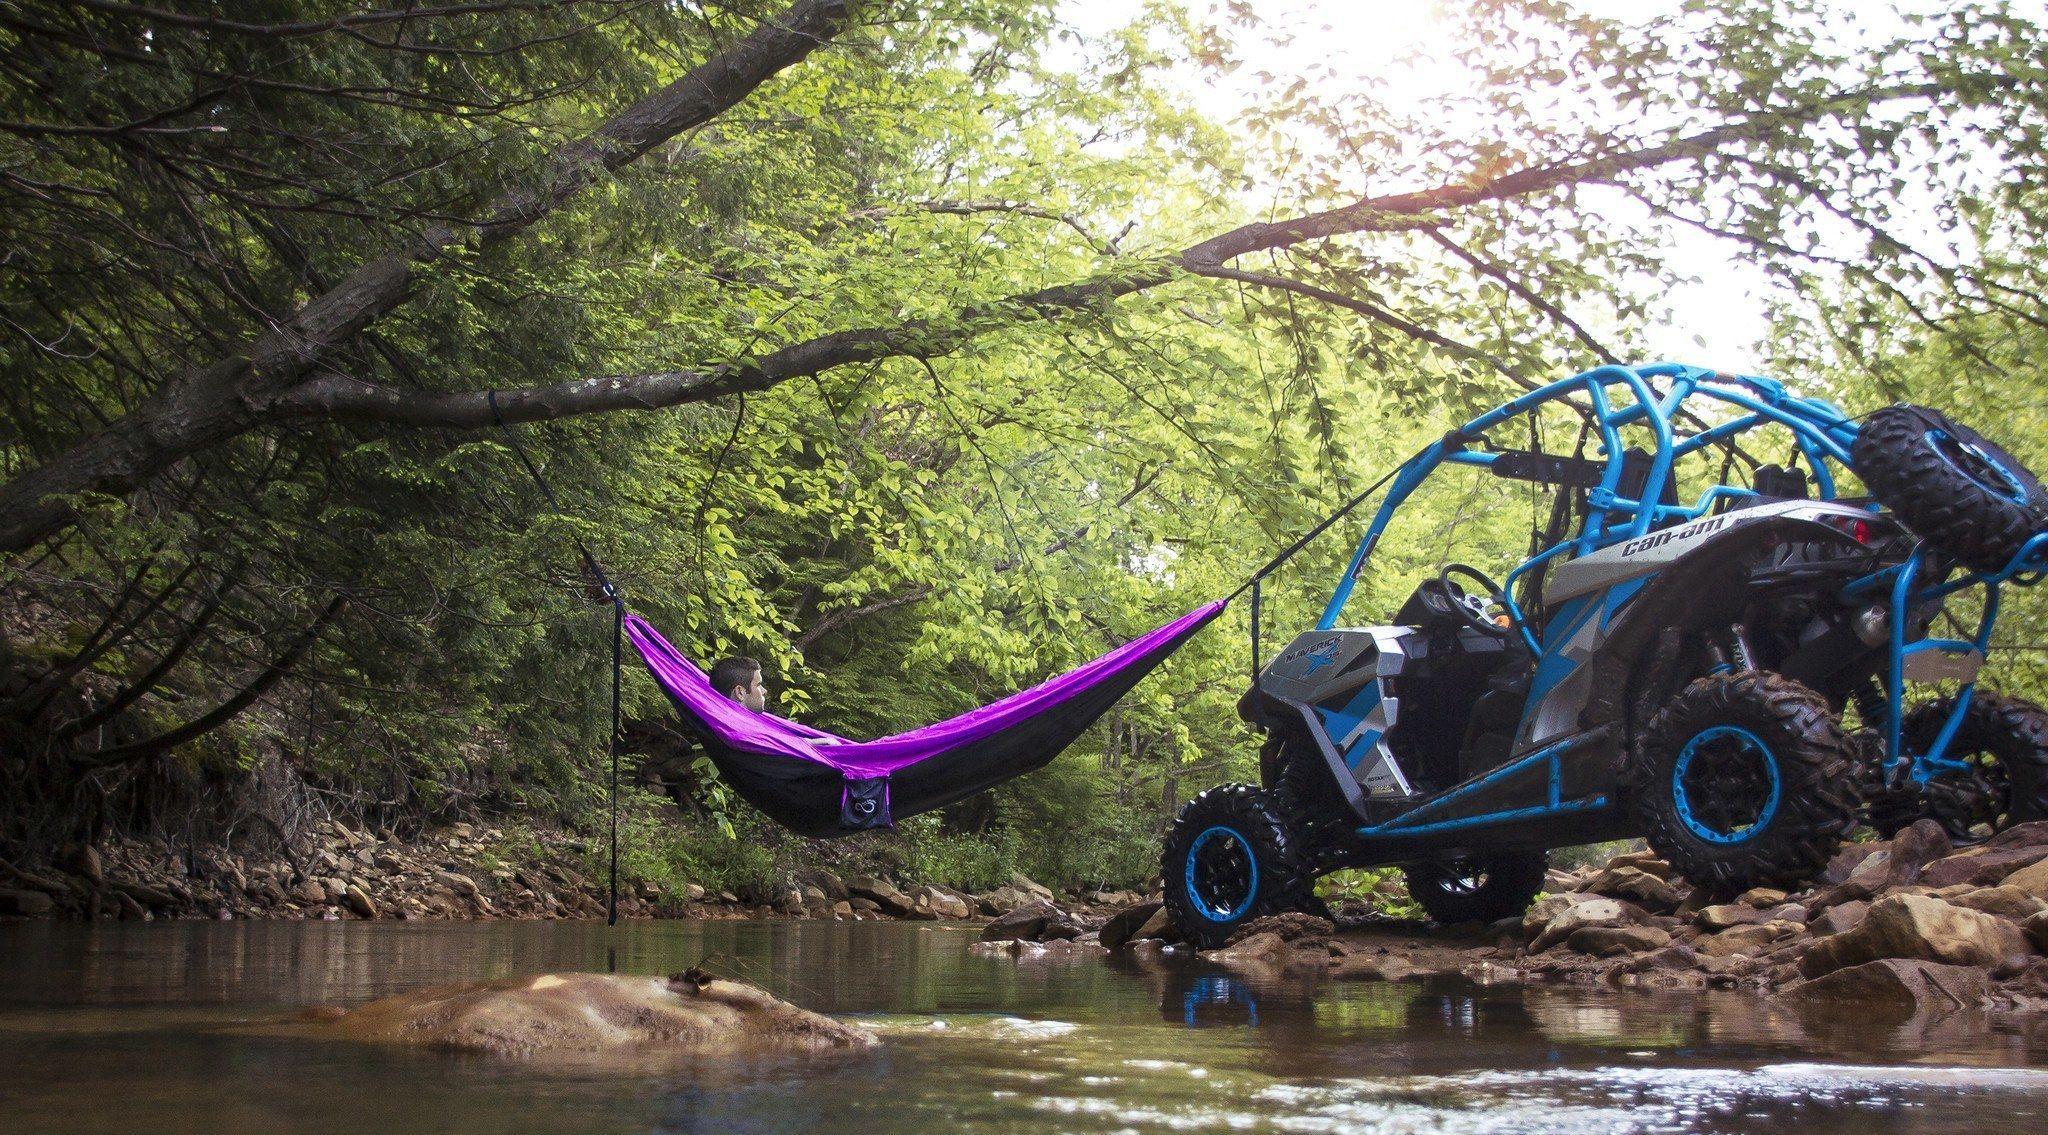 Double lightweight camping hammock u tree straps camping hammock